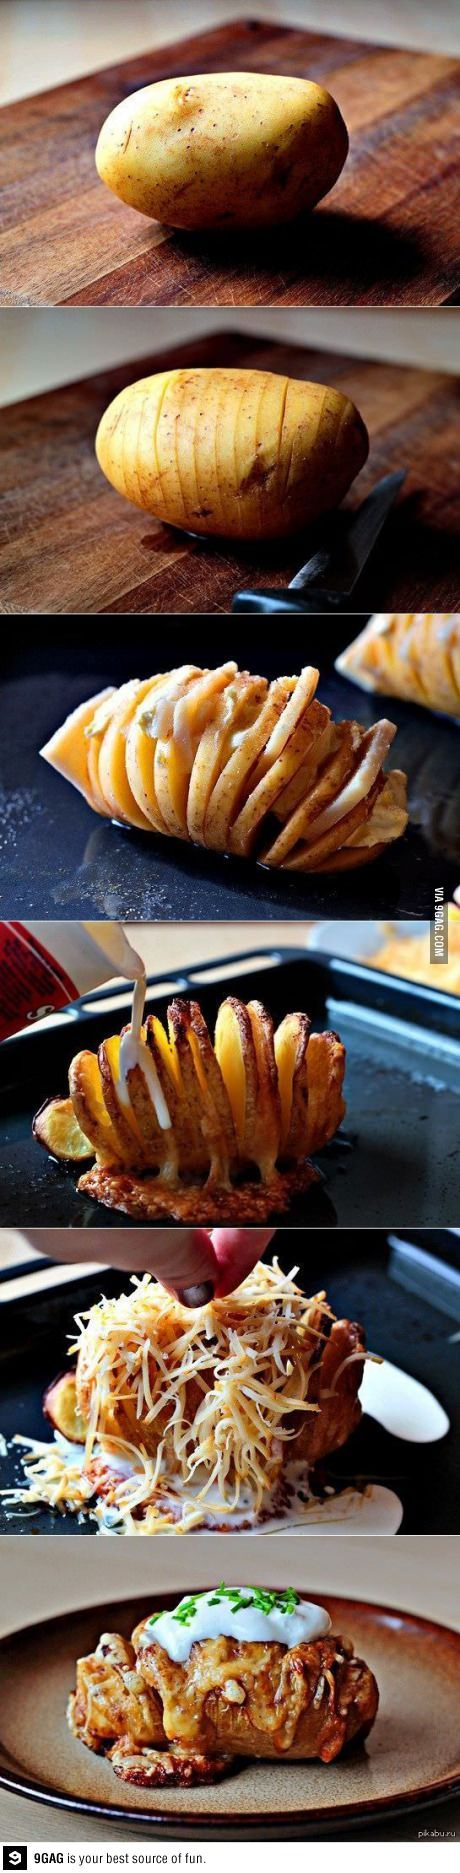 The perfect baked potato.